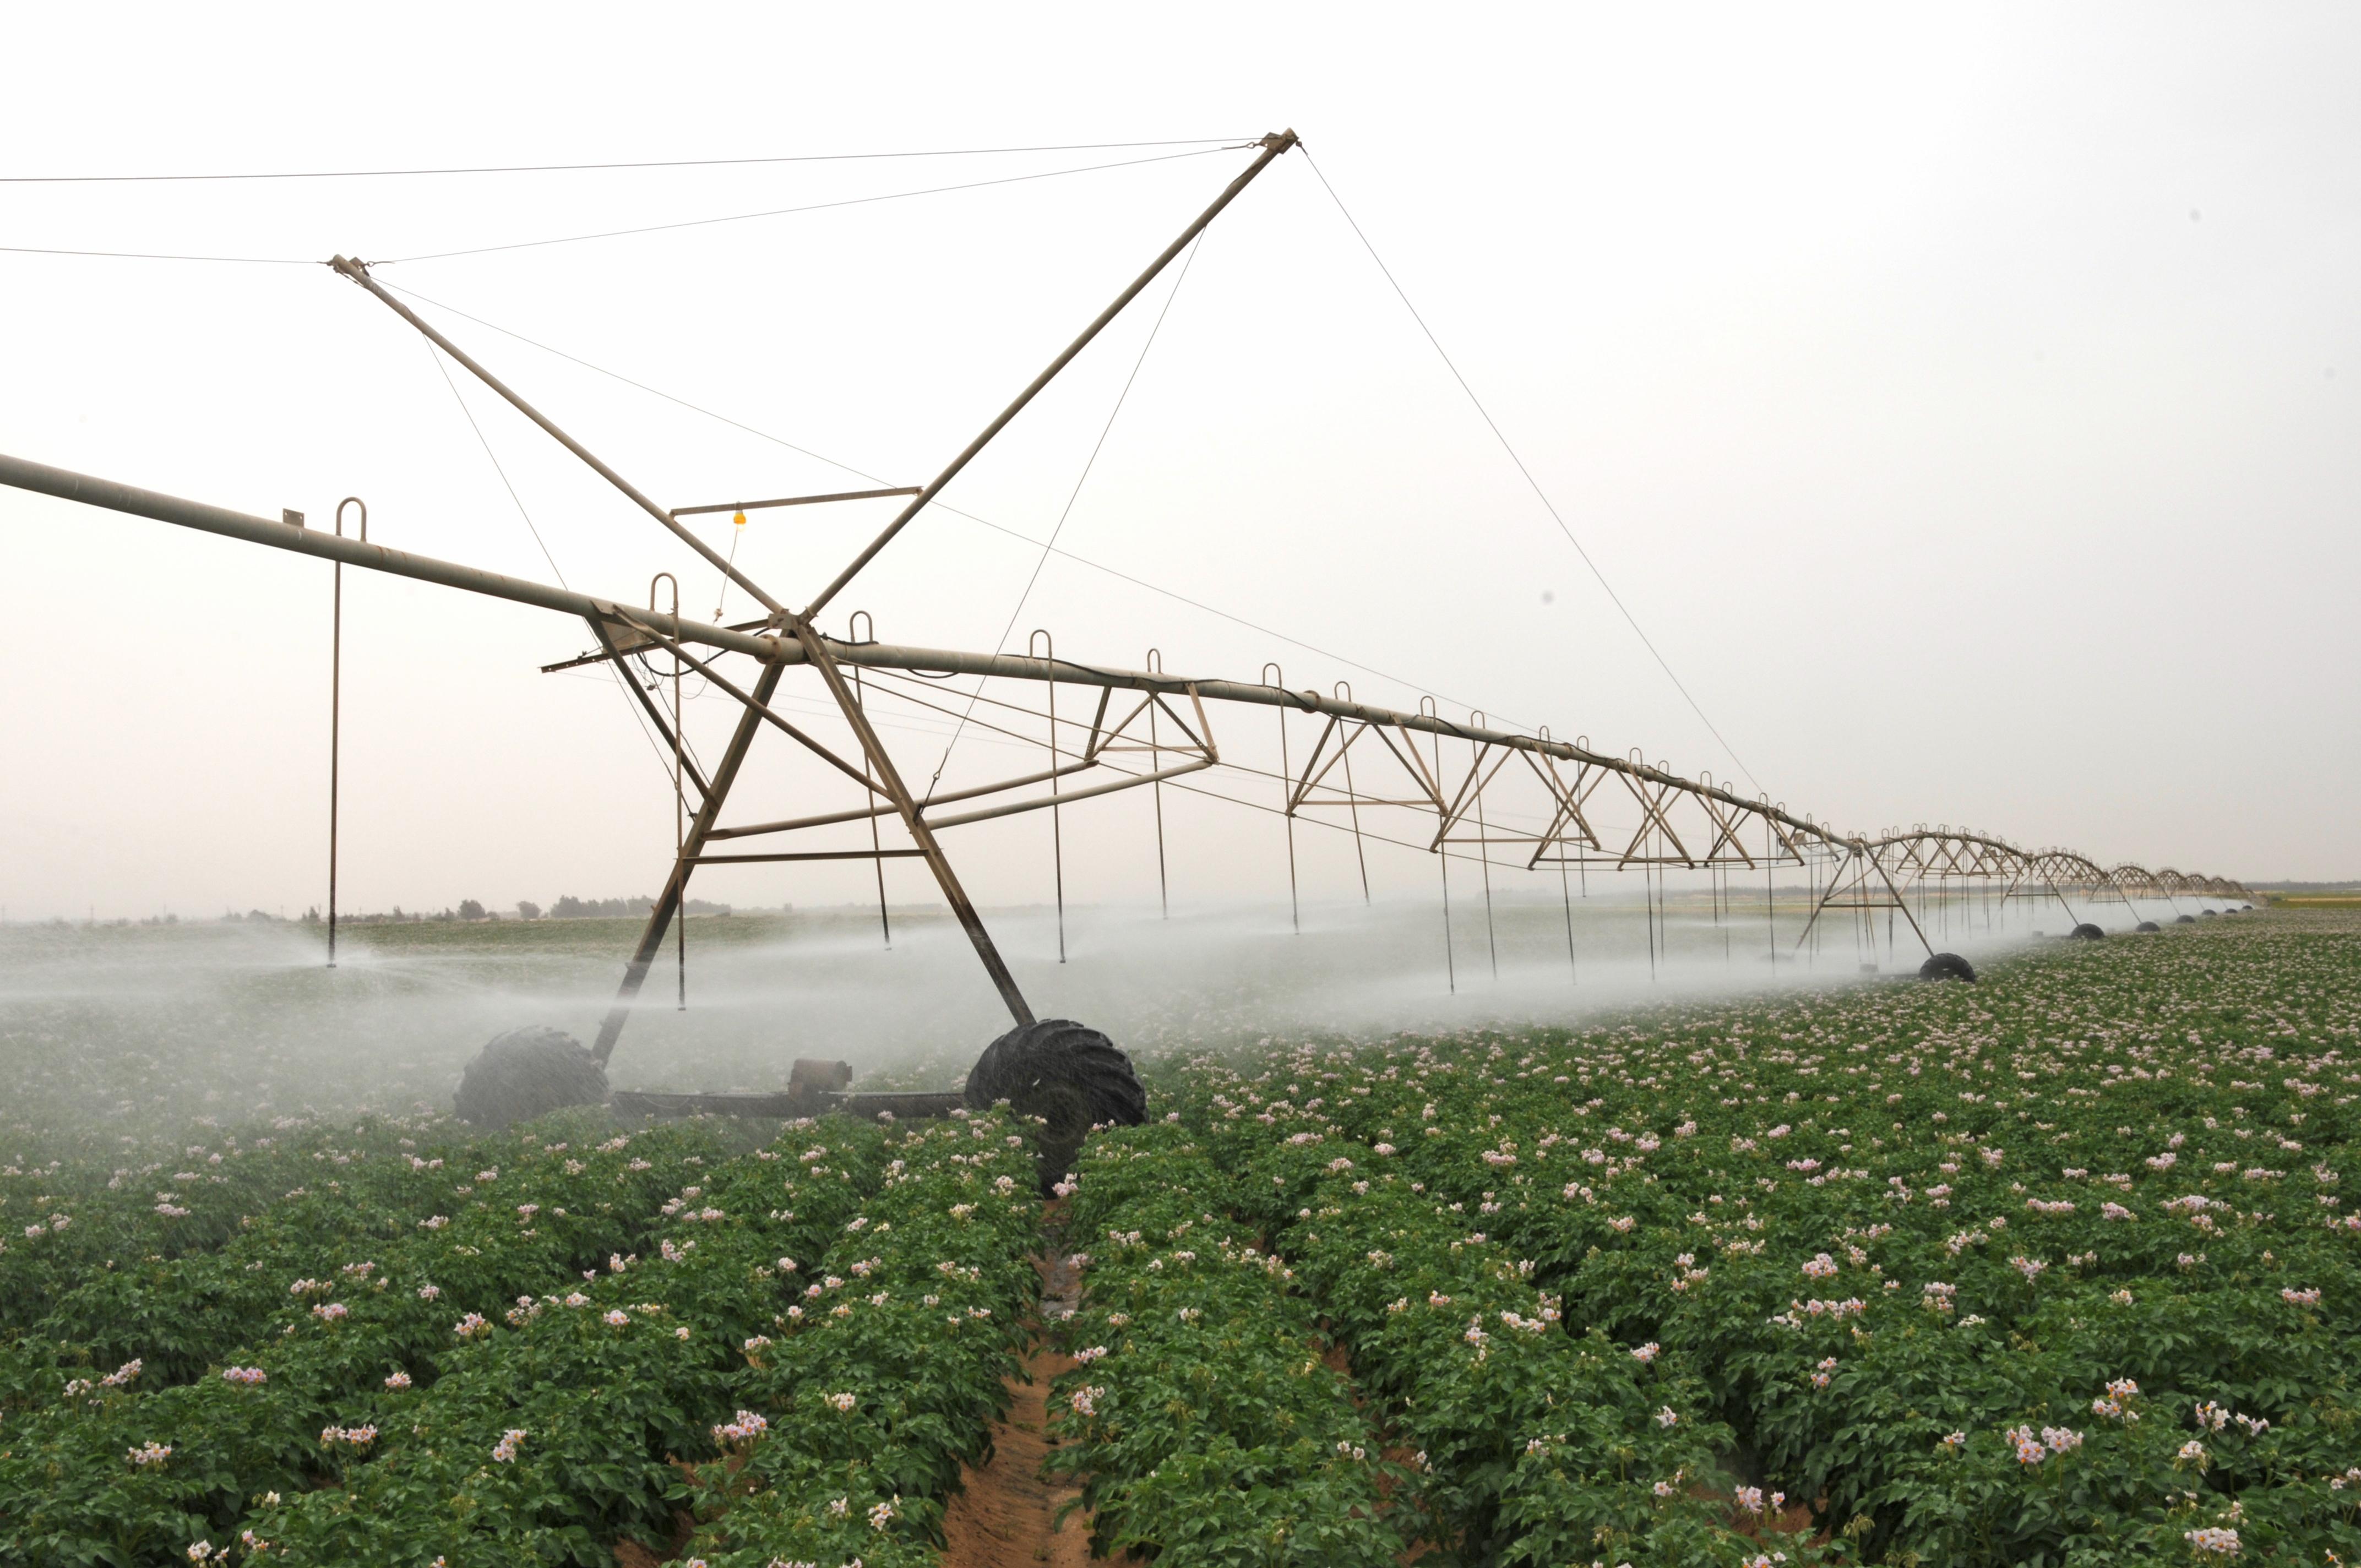 Alowaynat Farm